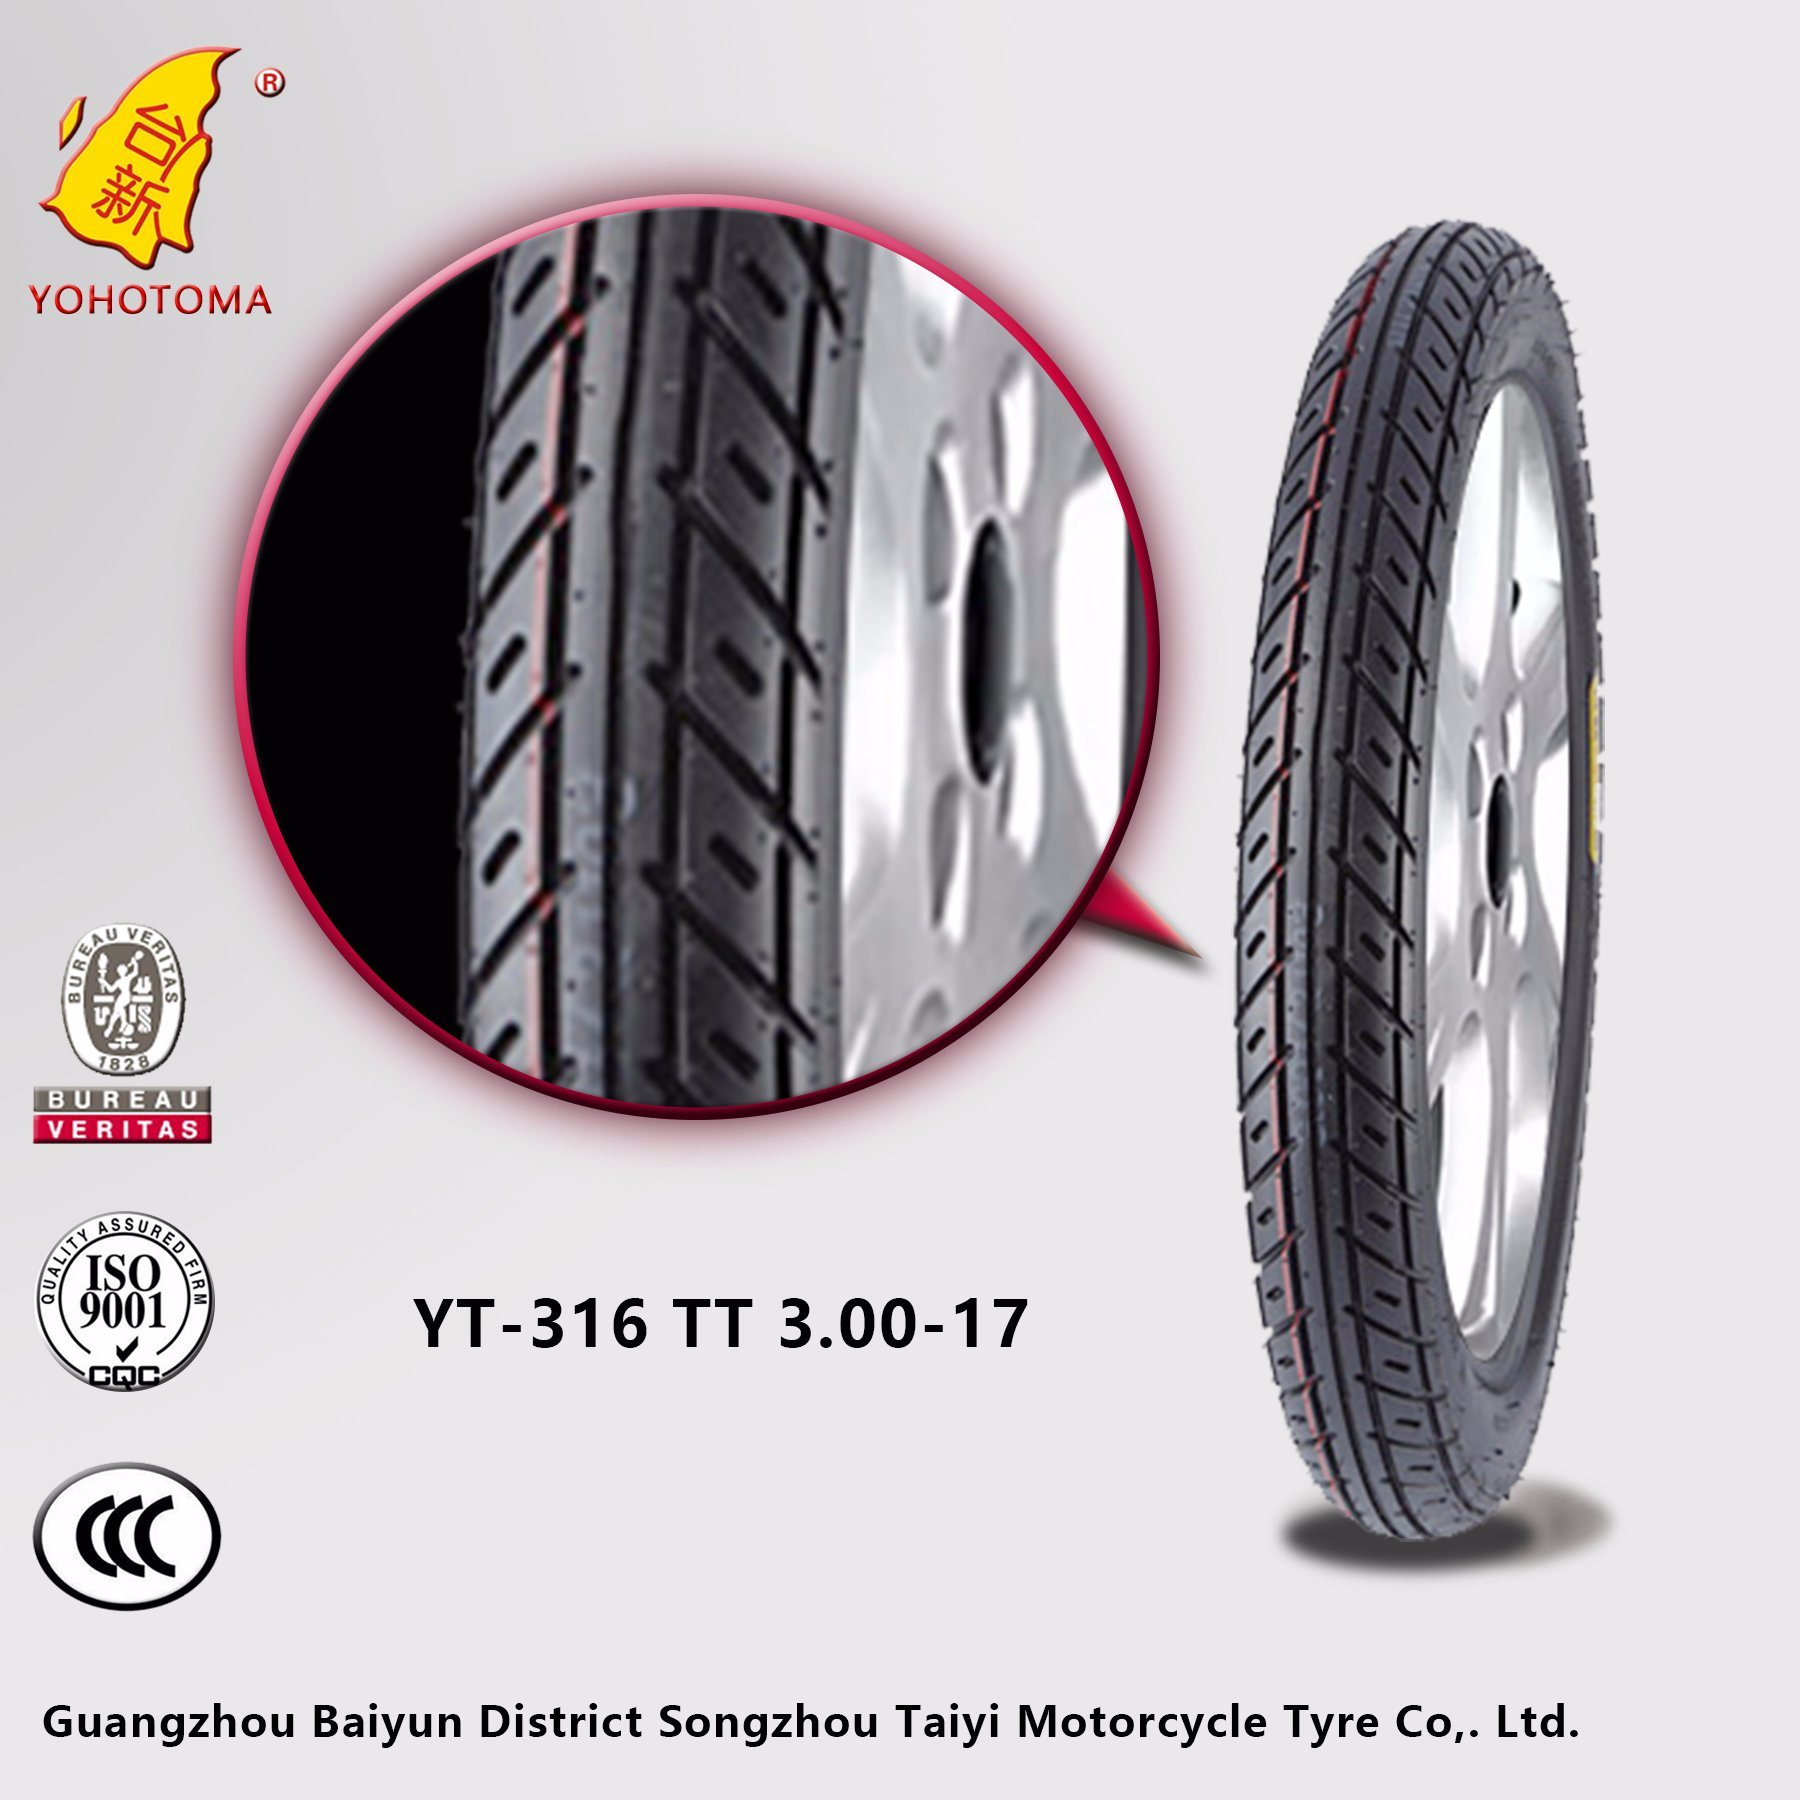 China Bridgestone Motorcycle Tires For Sale Tt 300 17 Yt316 China Harley Davidson Tires Best Motorbike Tyres